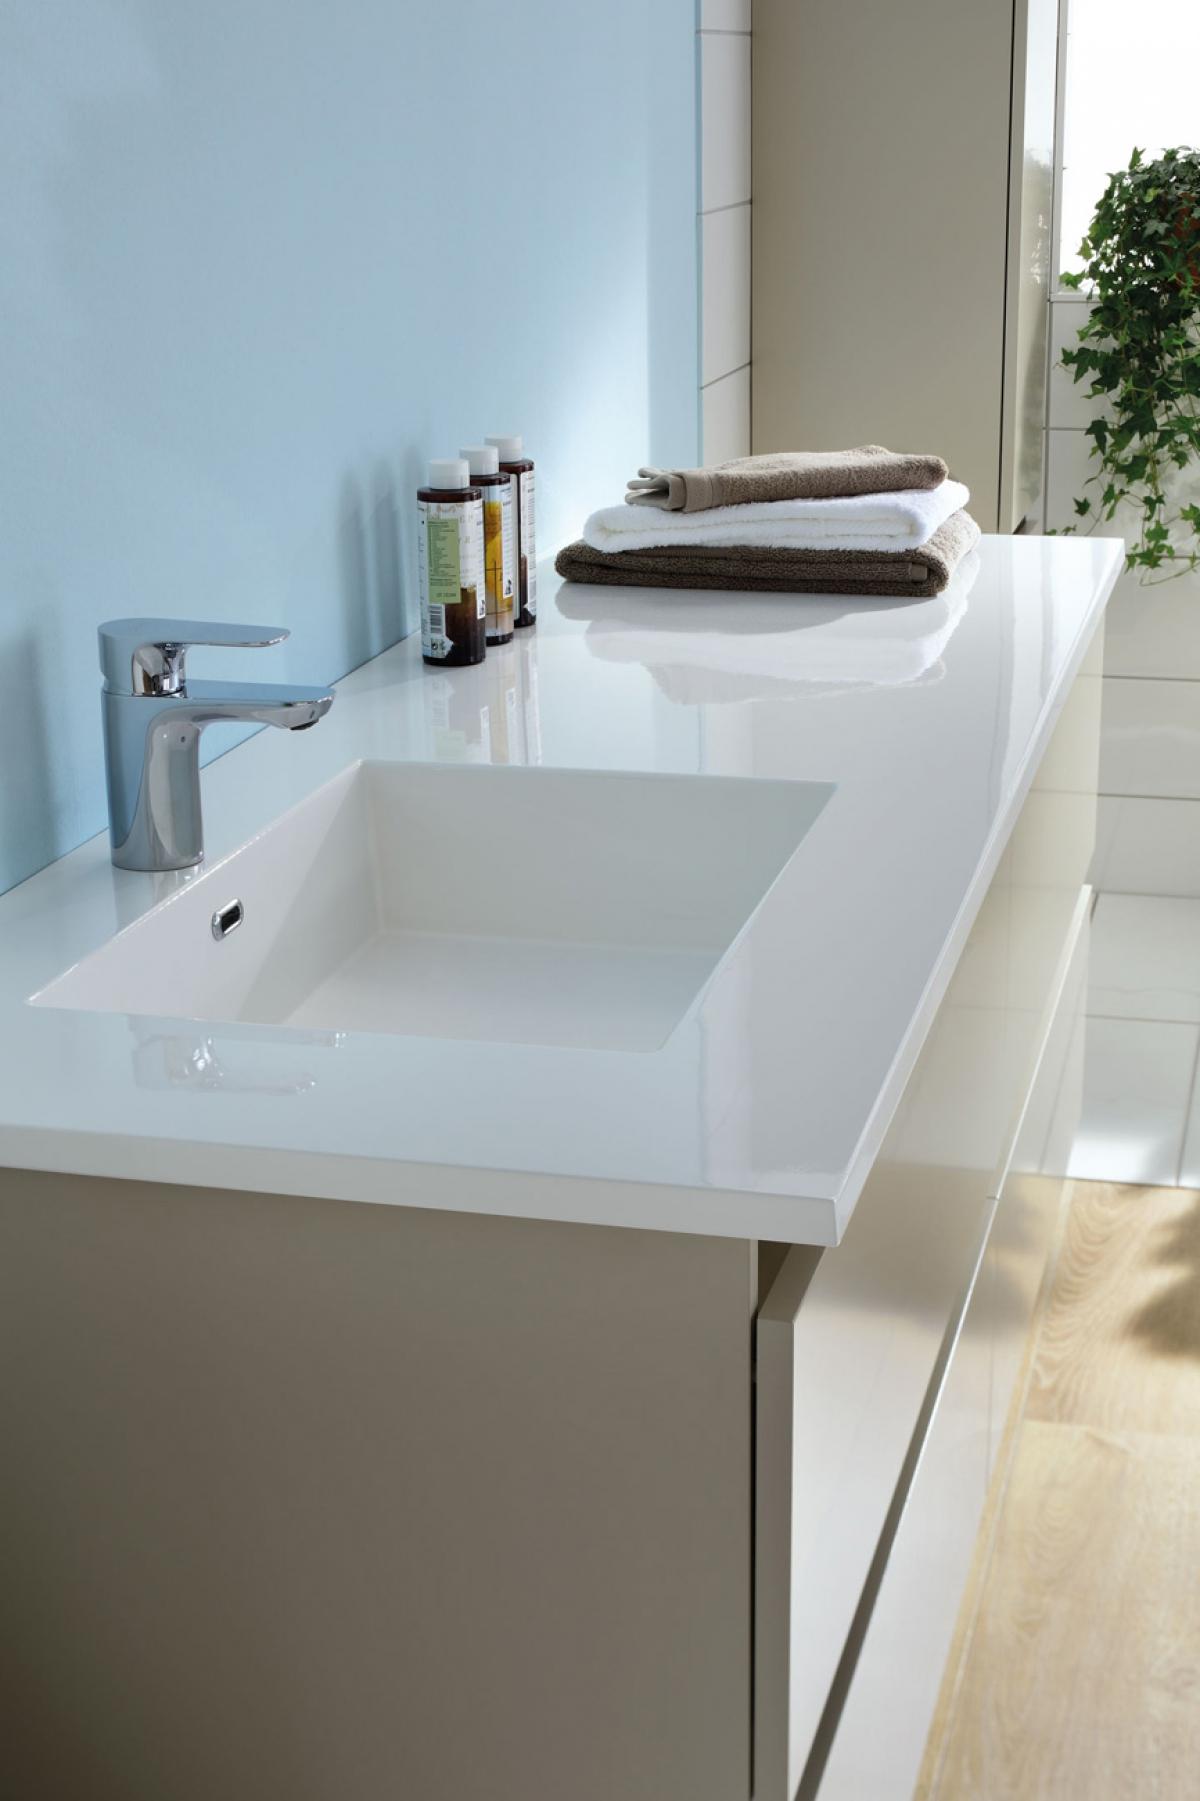 Meubles et vasque sobro sanijura induscabel salle de for Meuble vasque sanijura